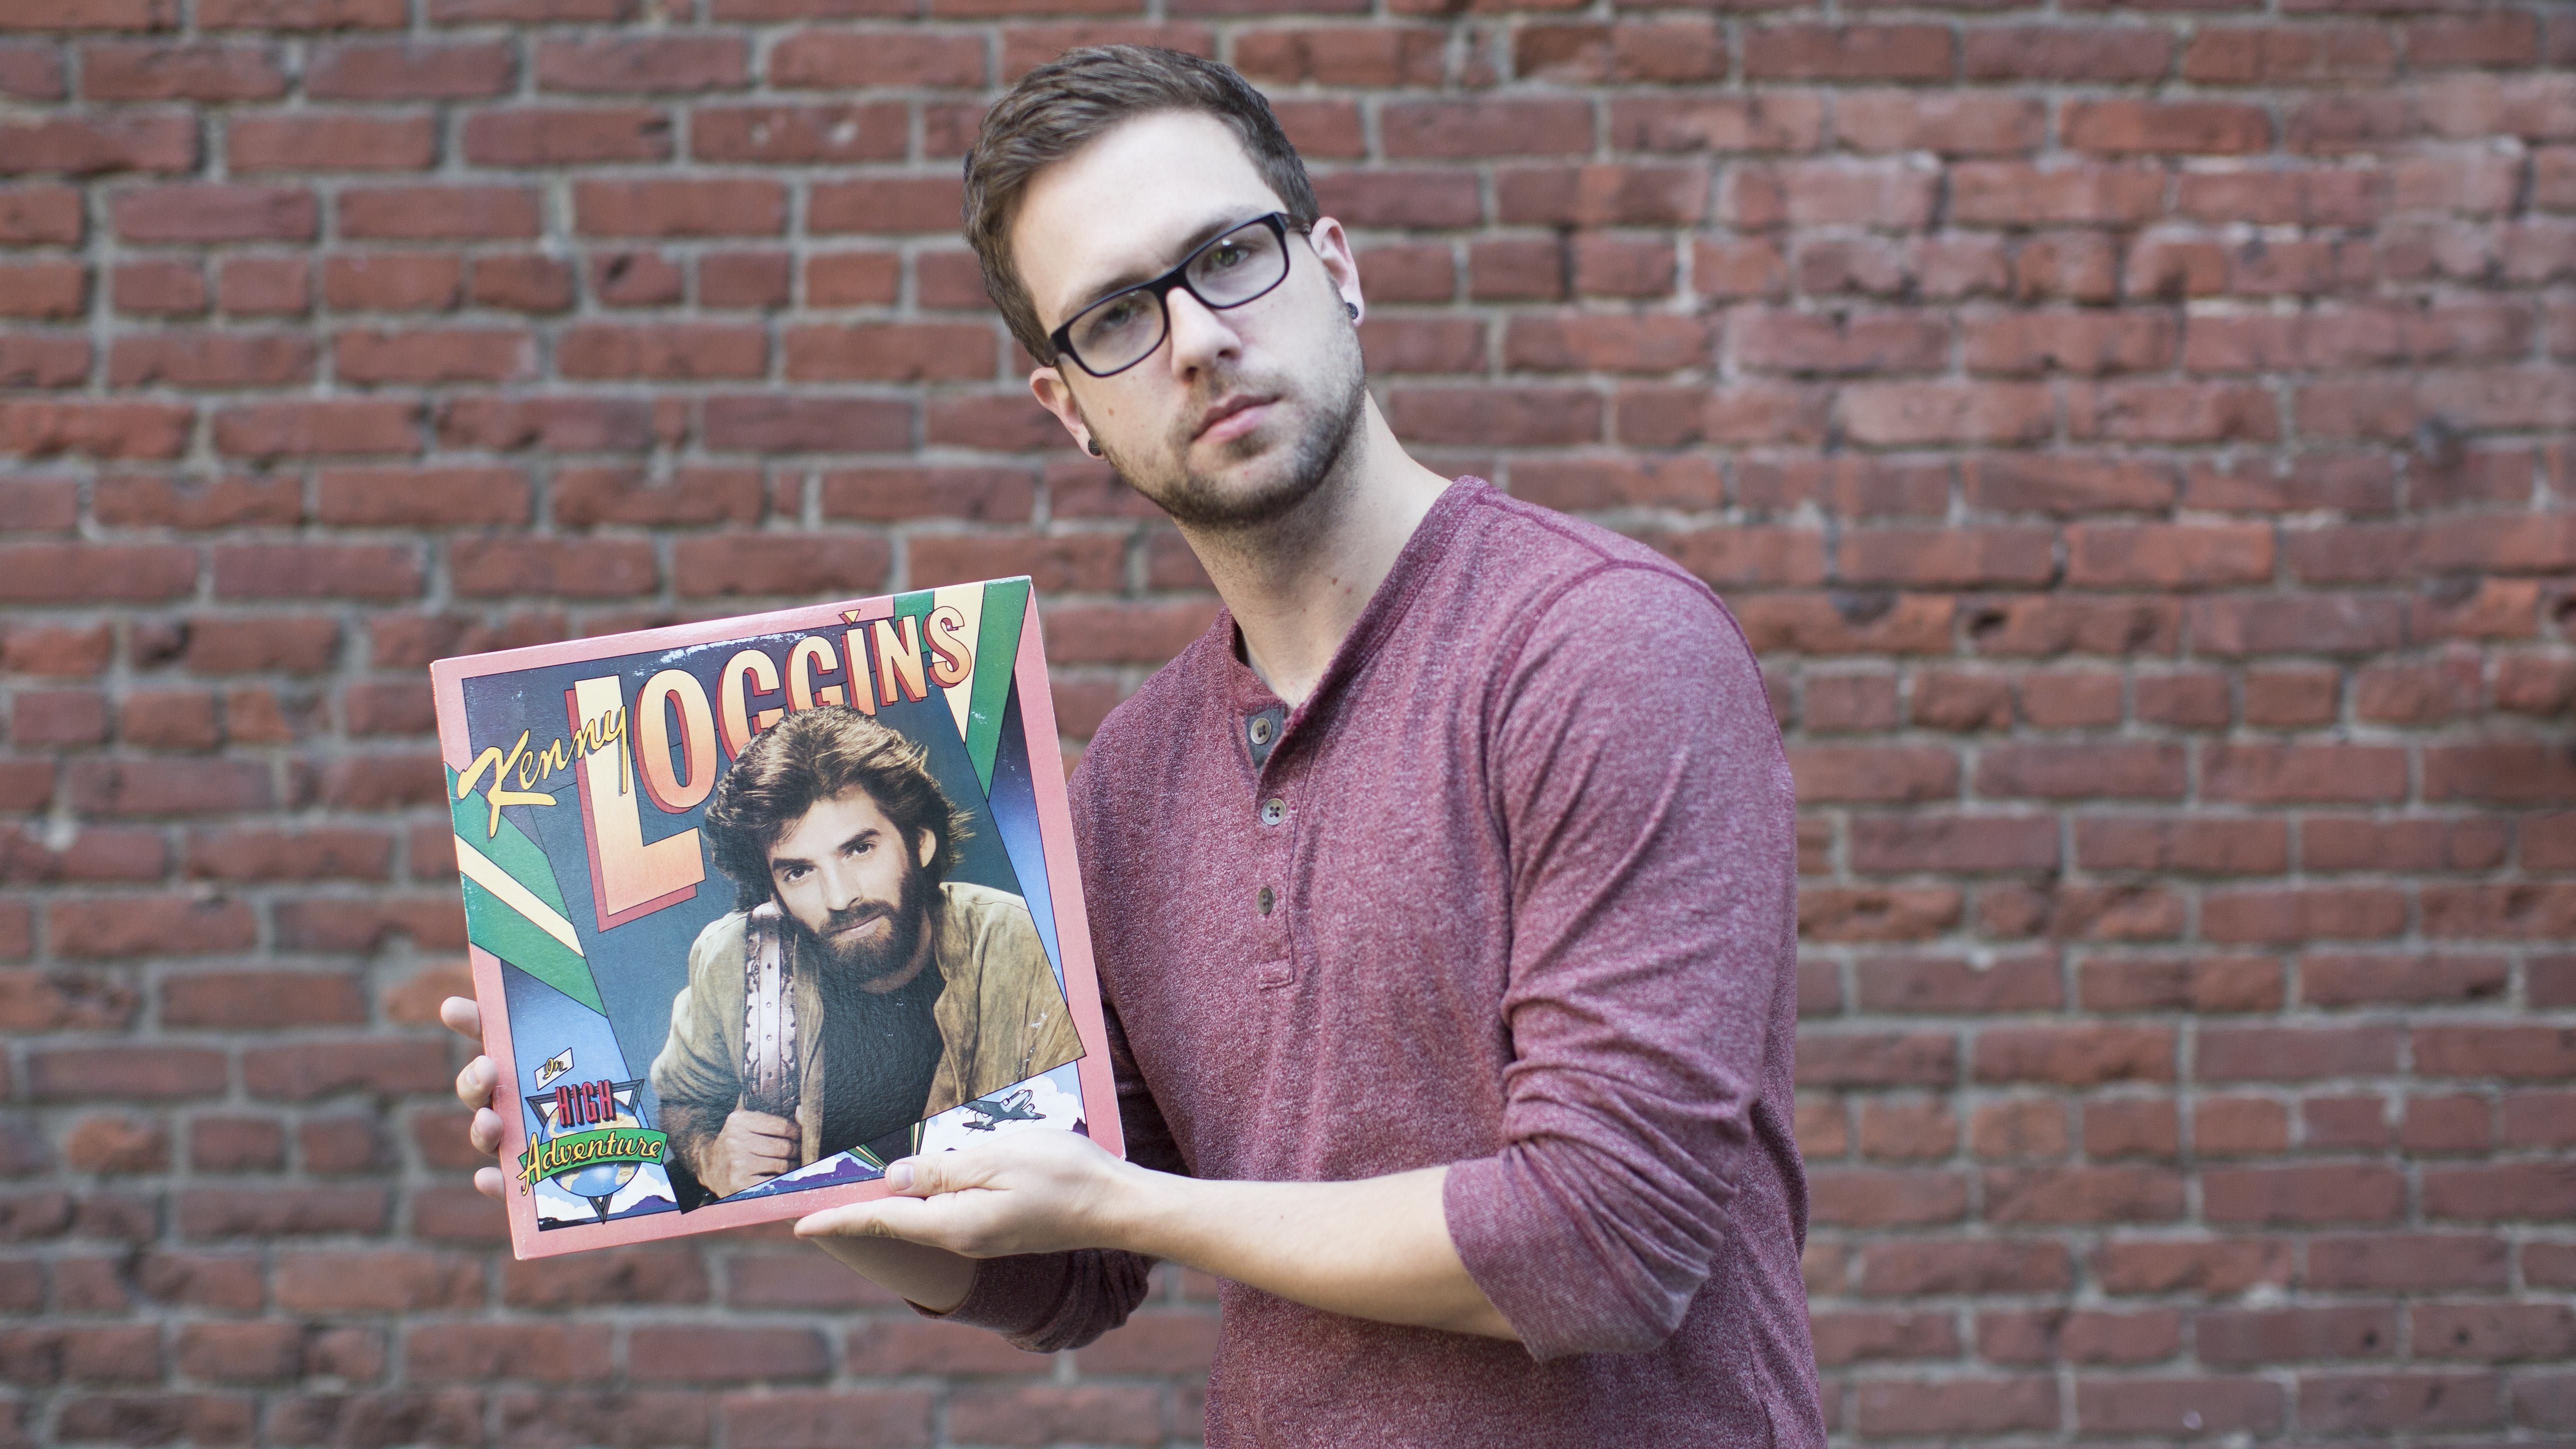 Matt from Finance wins Leafly's Thrift Shop Cannabis Cannabis Challenge